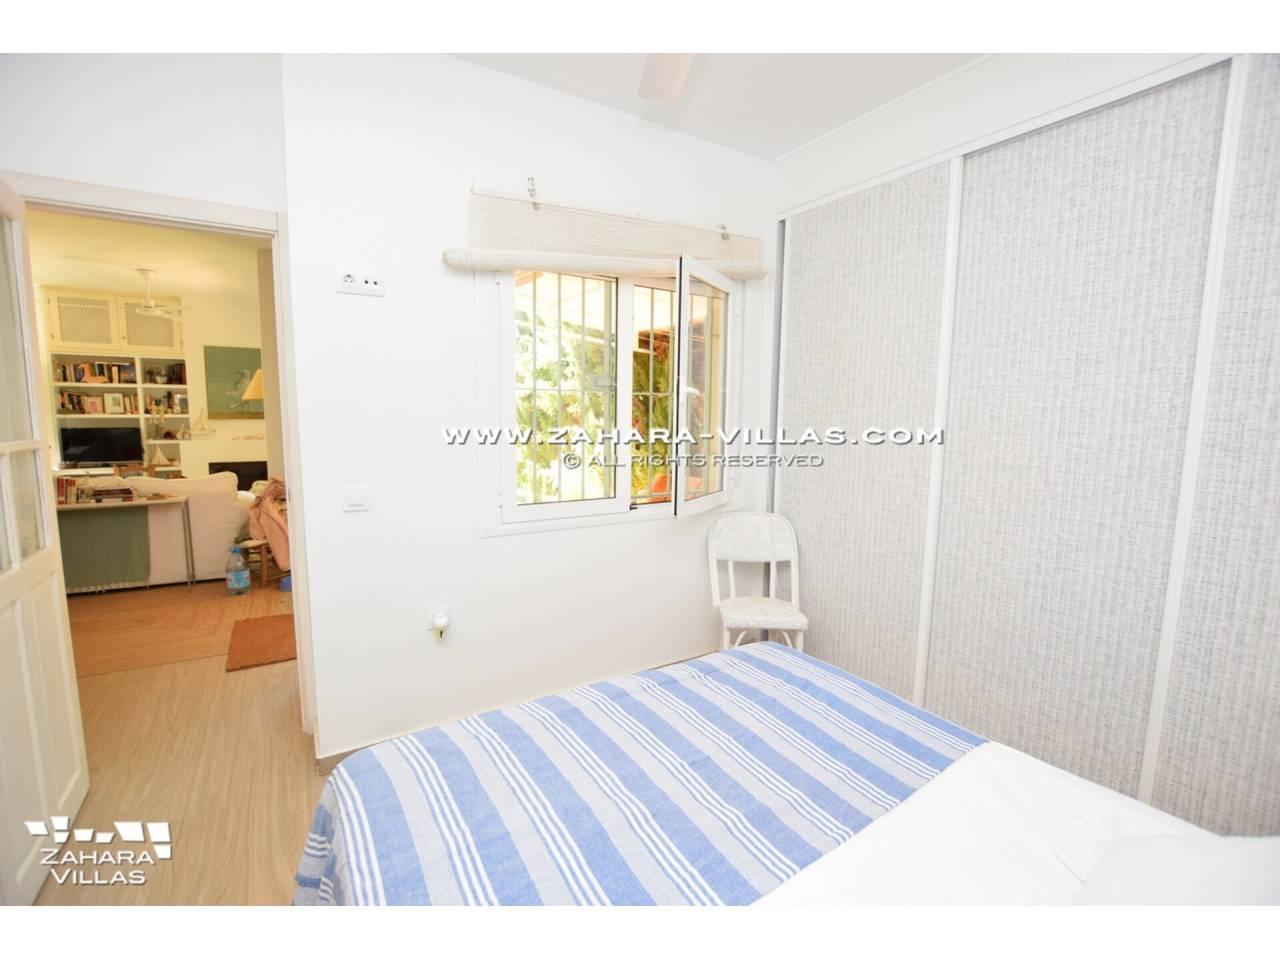 Imagen 21 de House for sale close to the beach, with sea views in Zahara de los Atunes